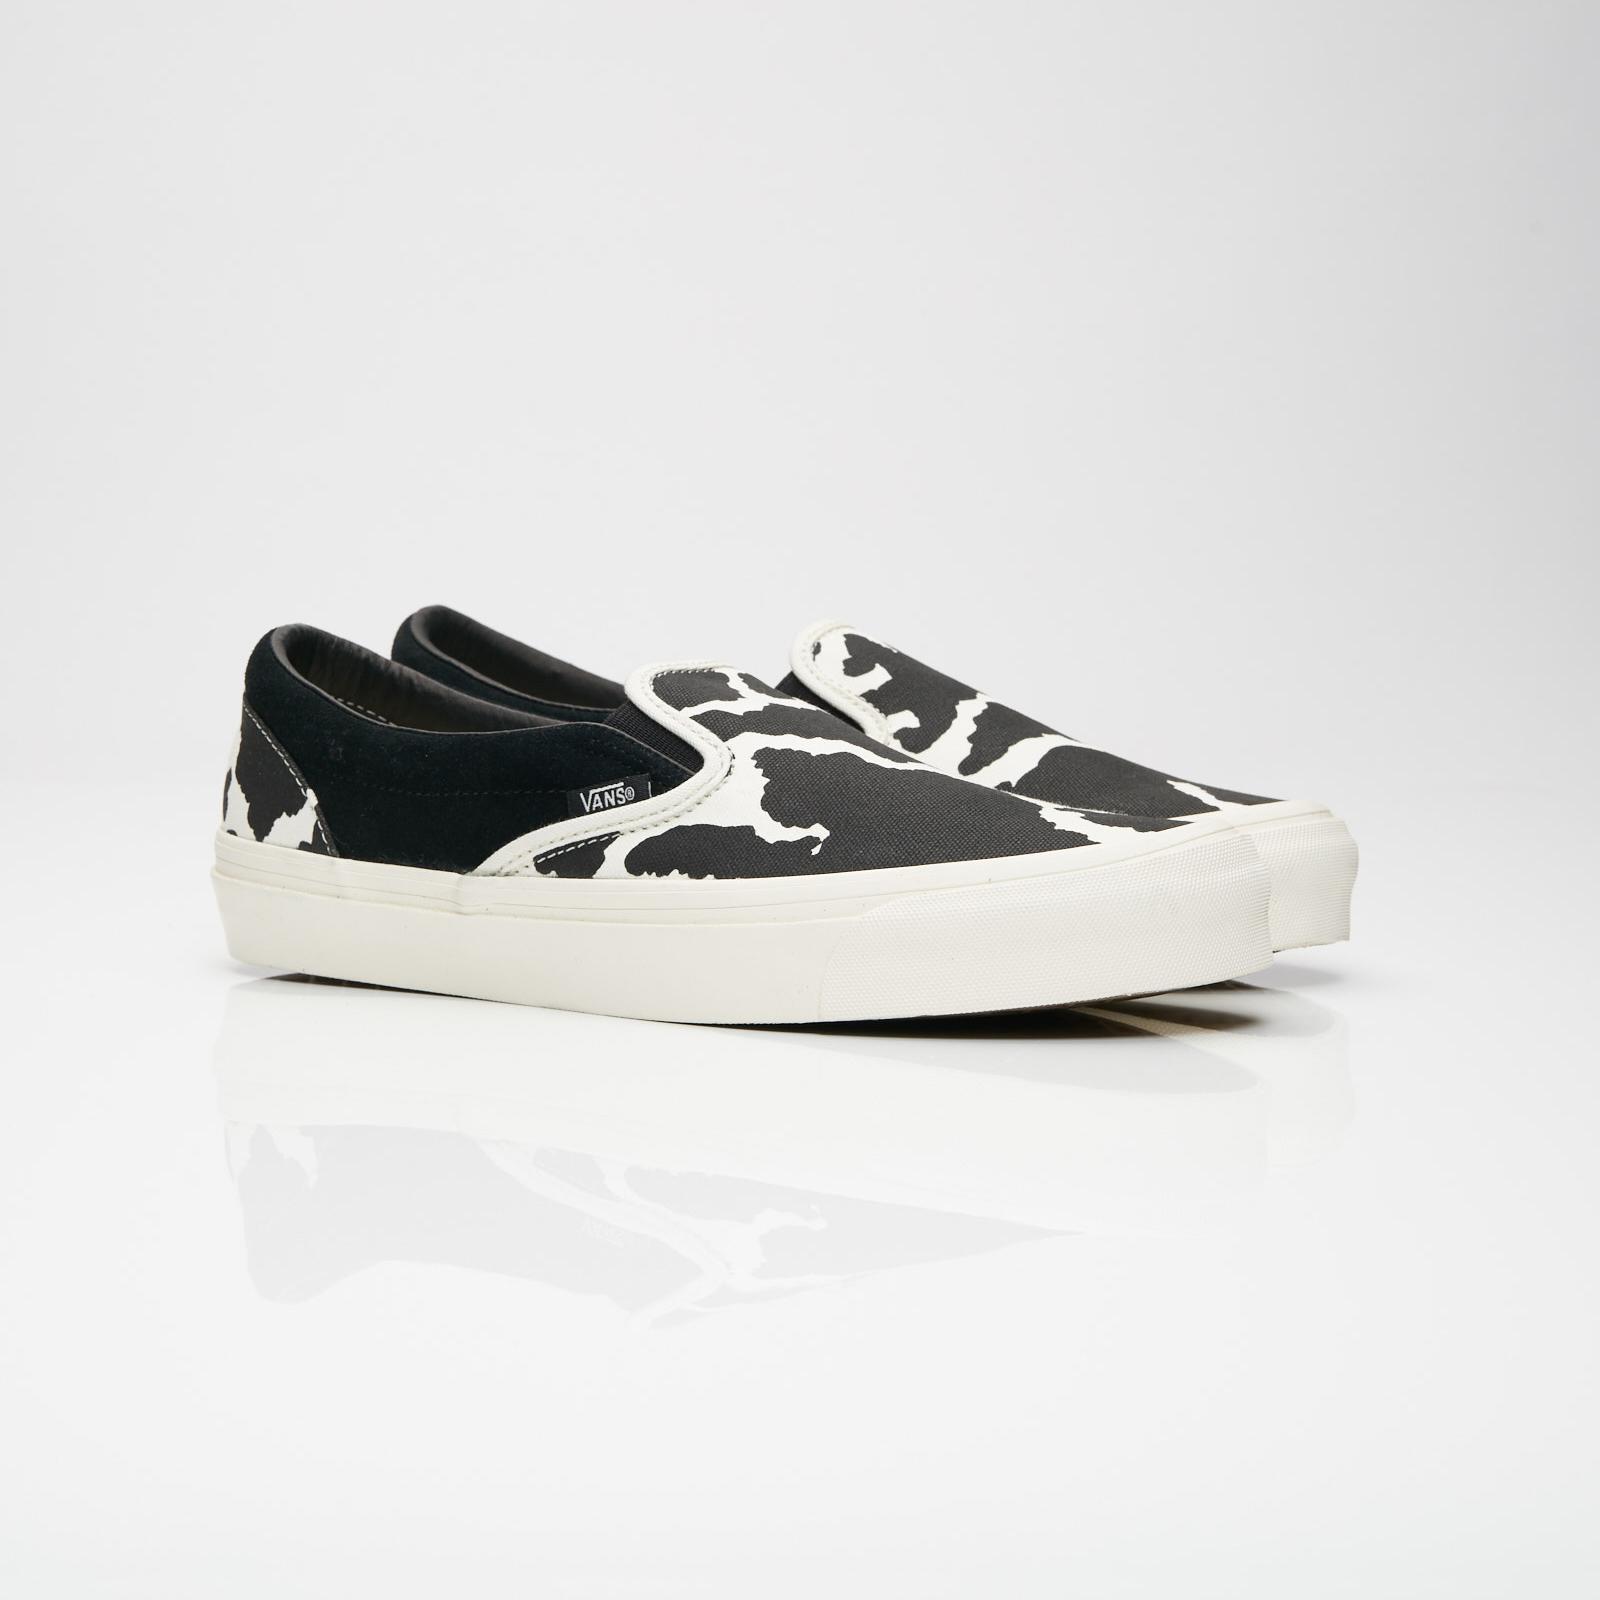 Vans UA OG Classic Slip-On LX - V00udfu9o - Sneakersnstuff ... 6963823fd